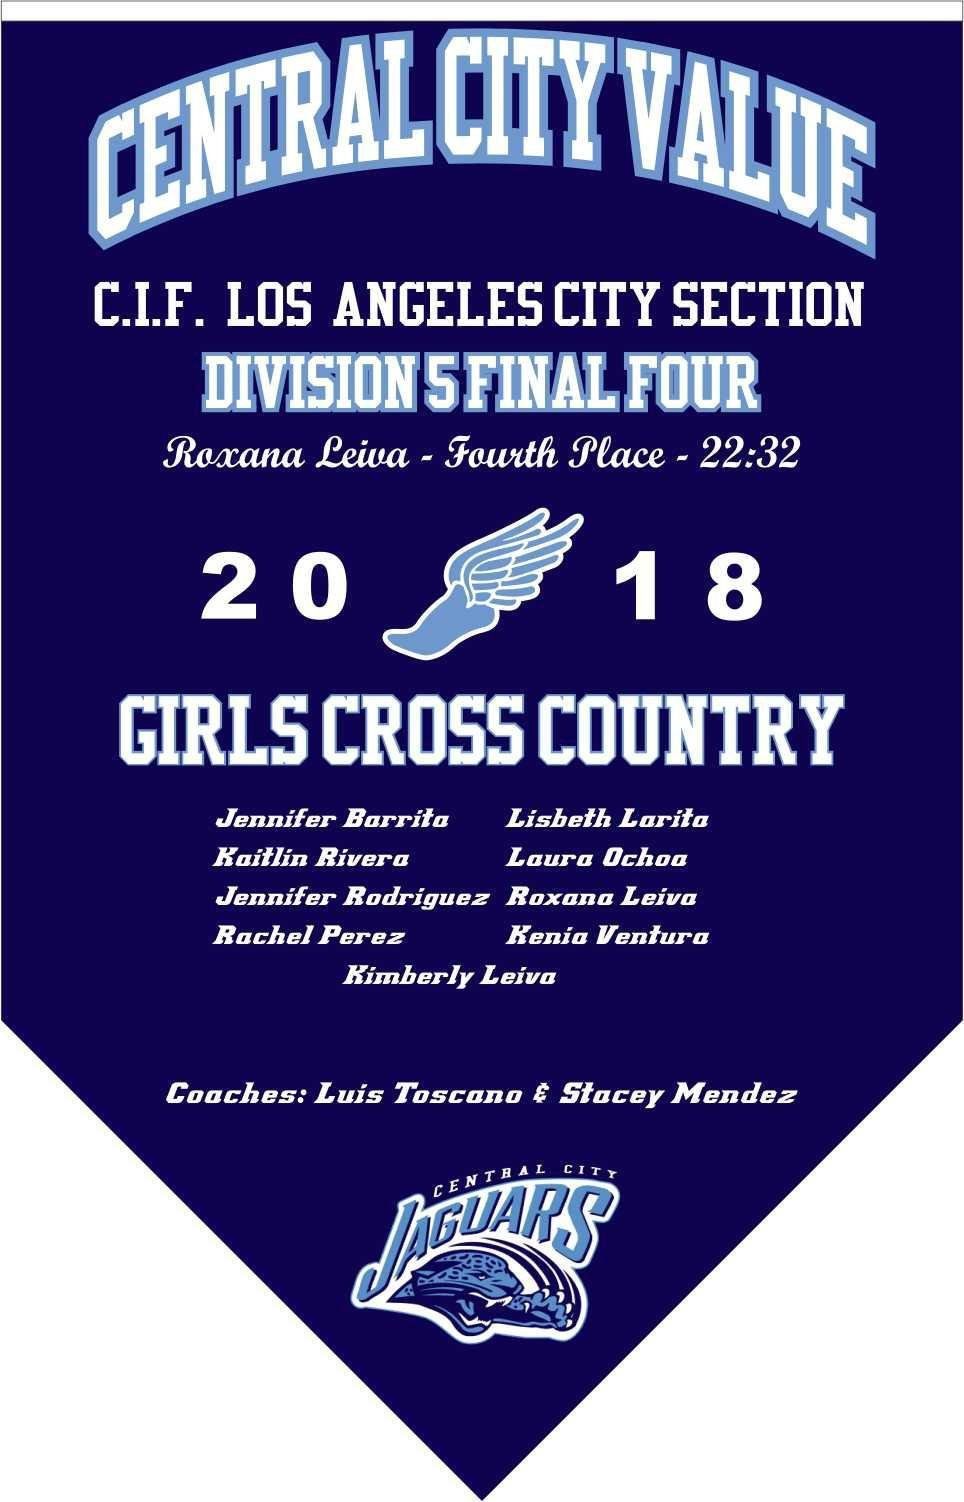 2018 Girls Cross Country Final Four Banner